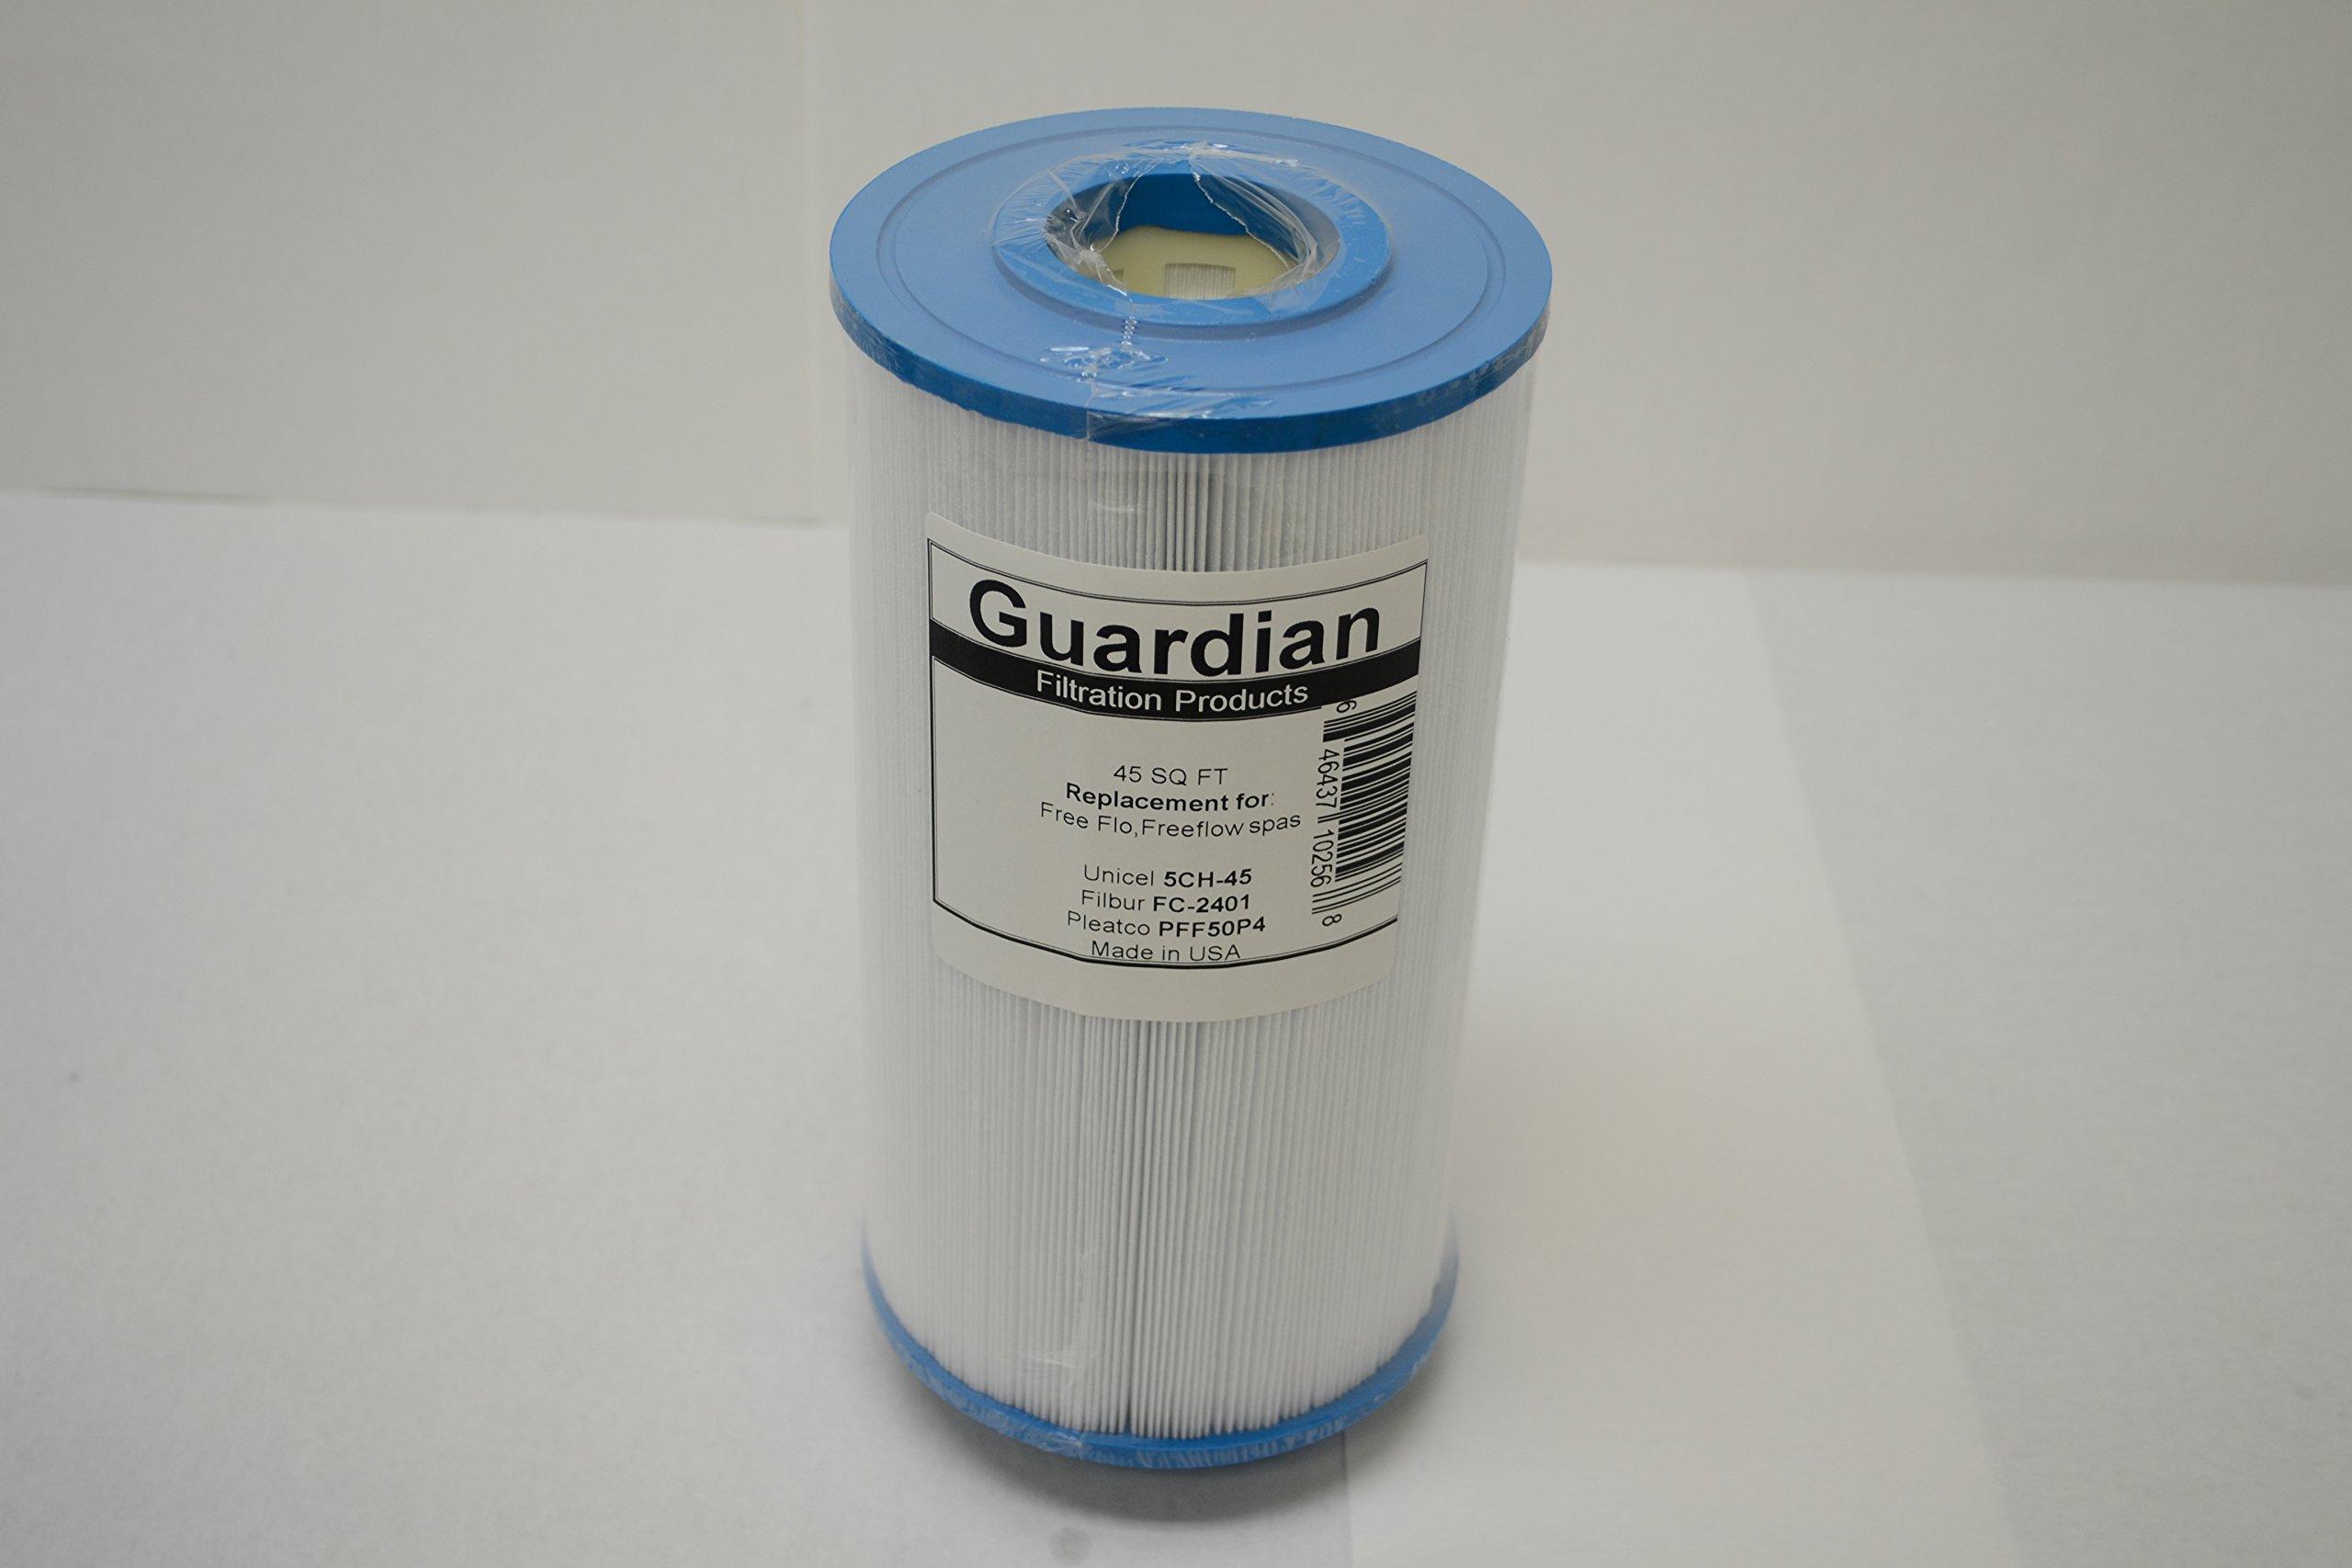 Guardian pool/spa filter fits:Pleatco: PFF50P4 | Unicel: 5CH-45 | Filbur: FC-2401freeflo,freeflow, aquaterra spas